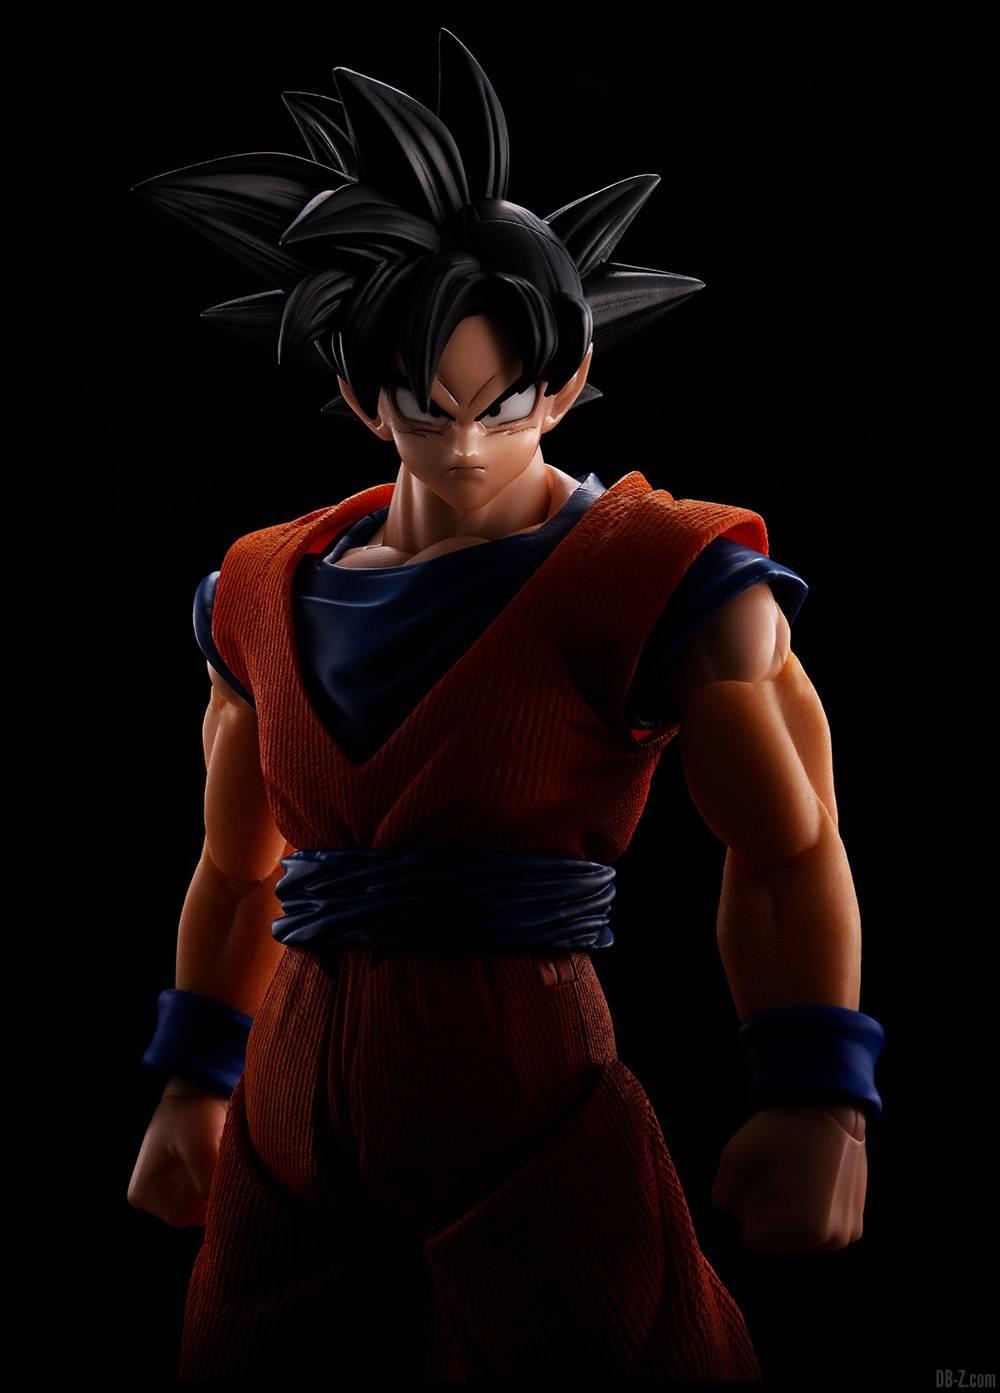 Figurine Imagination Works Son Goku